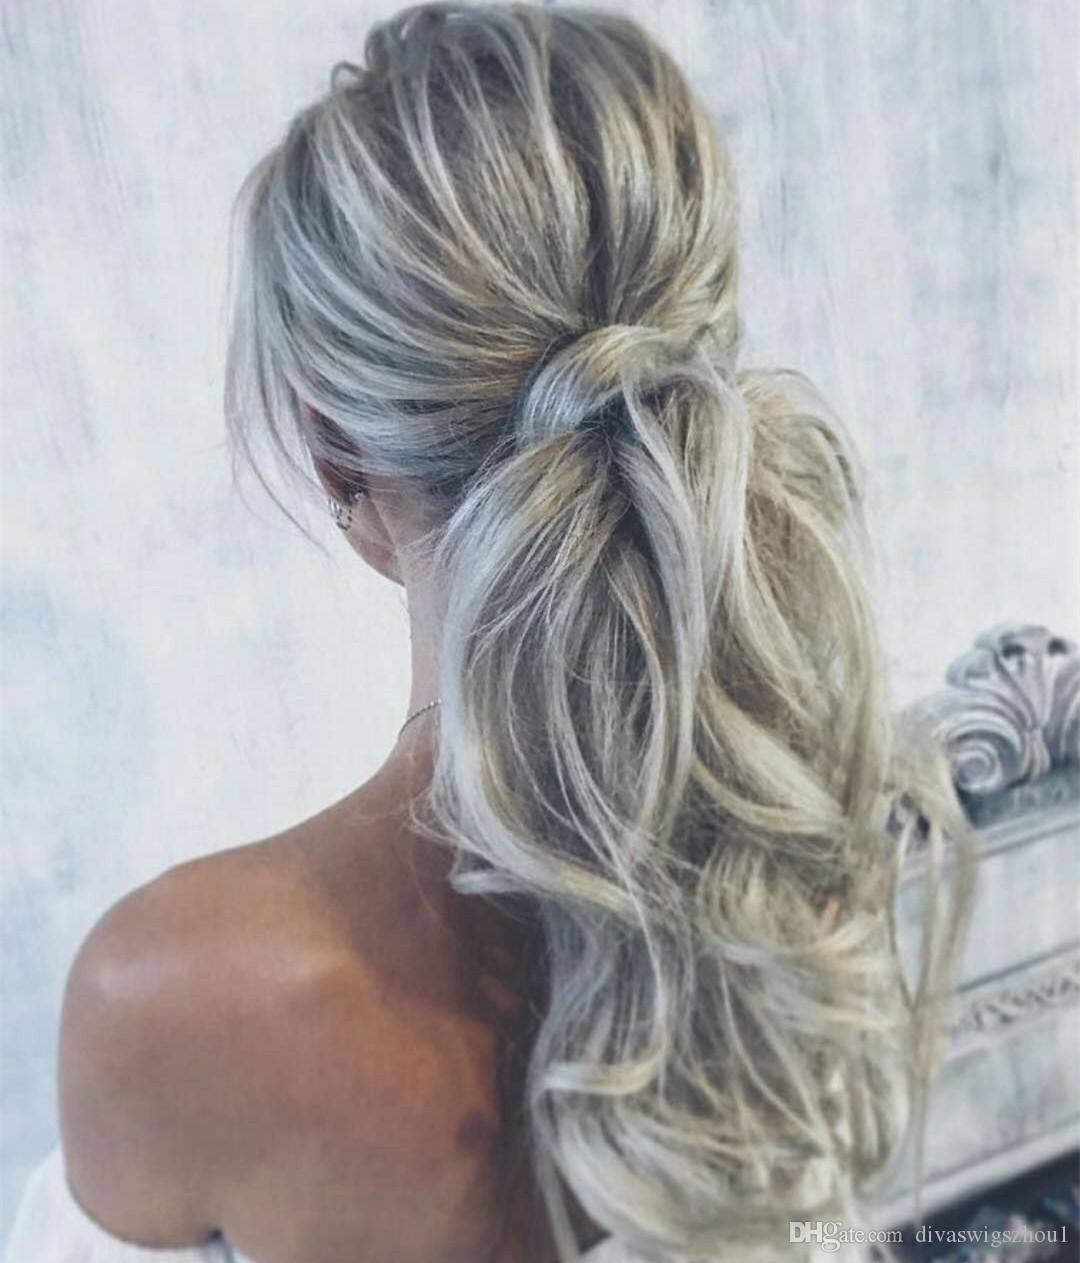 Fashion Silver Hair Ponytail Drawstring in HairPieces Remy brasileño remy de pelo 100 g por paquete Extensiones de cabello humano Estilo de cabello gris